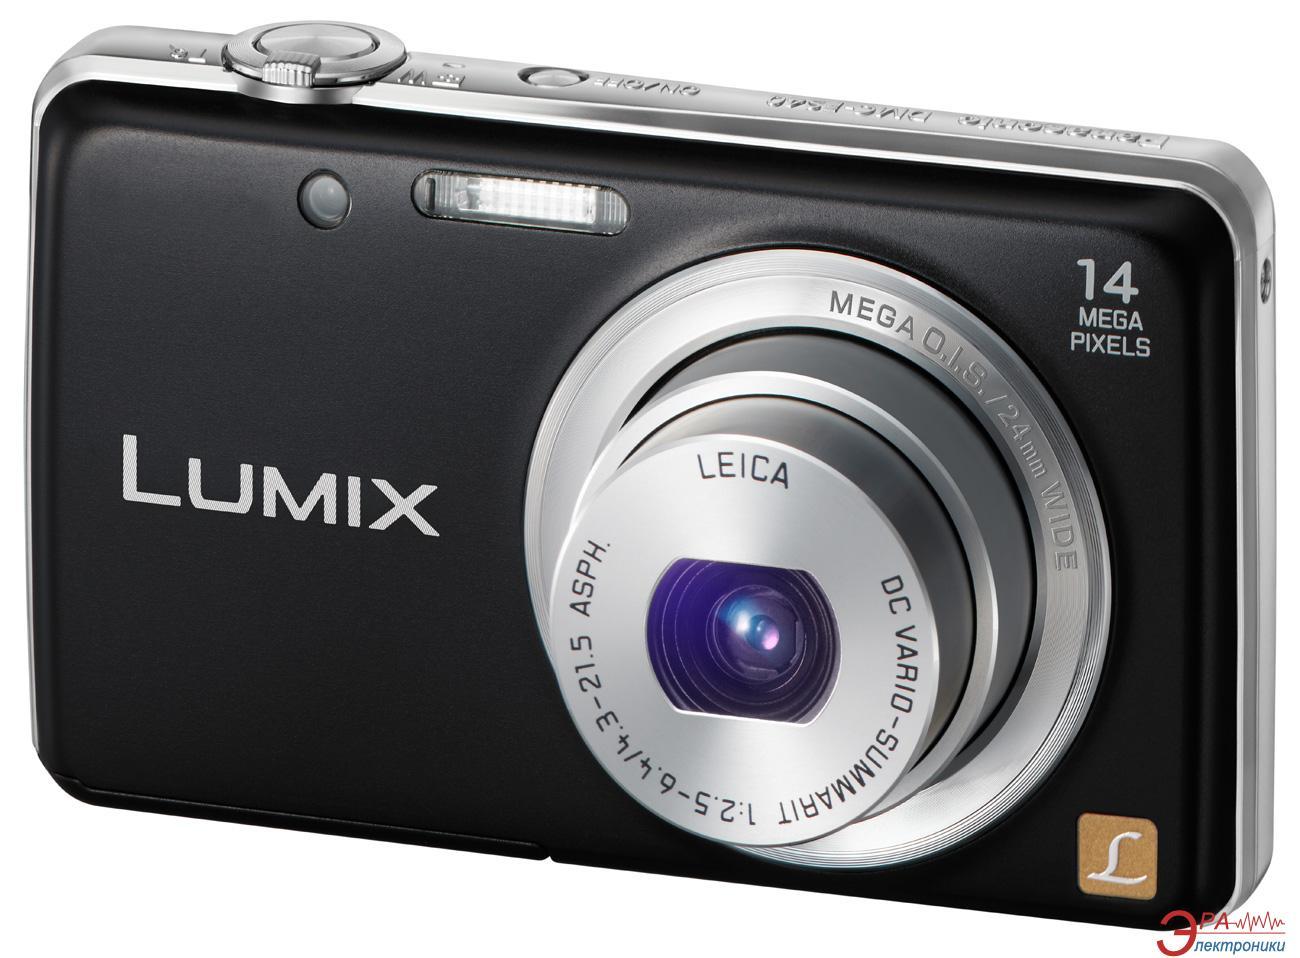 Цифровой фотоаппарат Panasonic Lumix DMC-FS40 Black